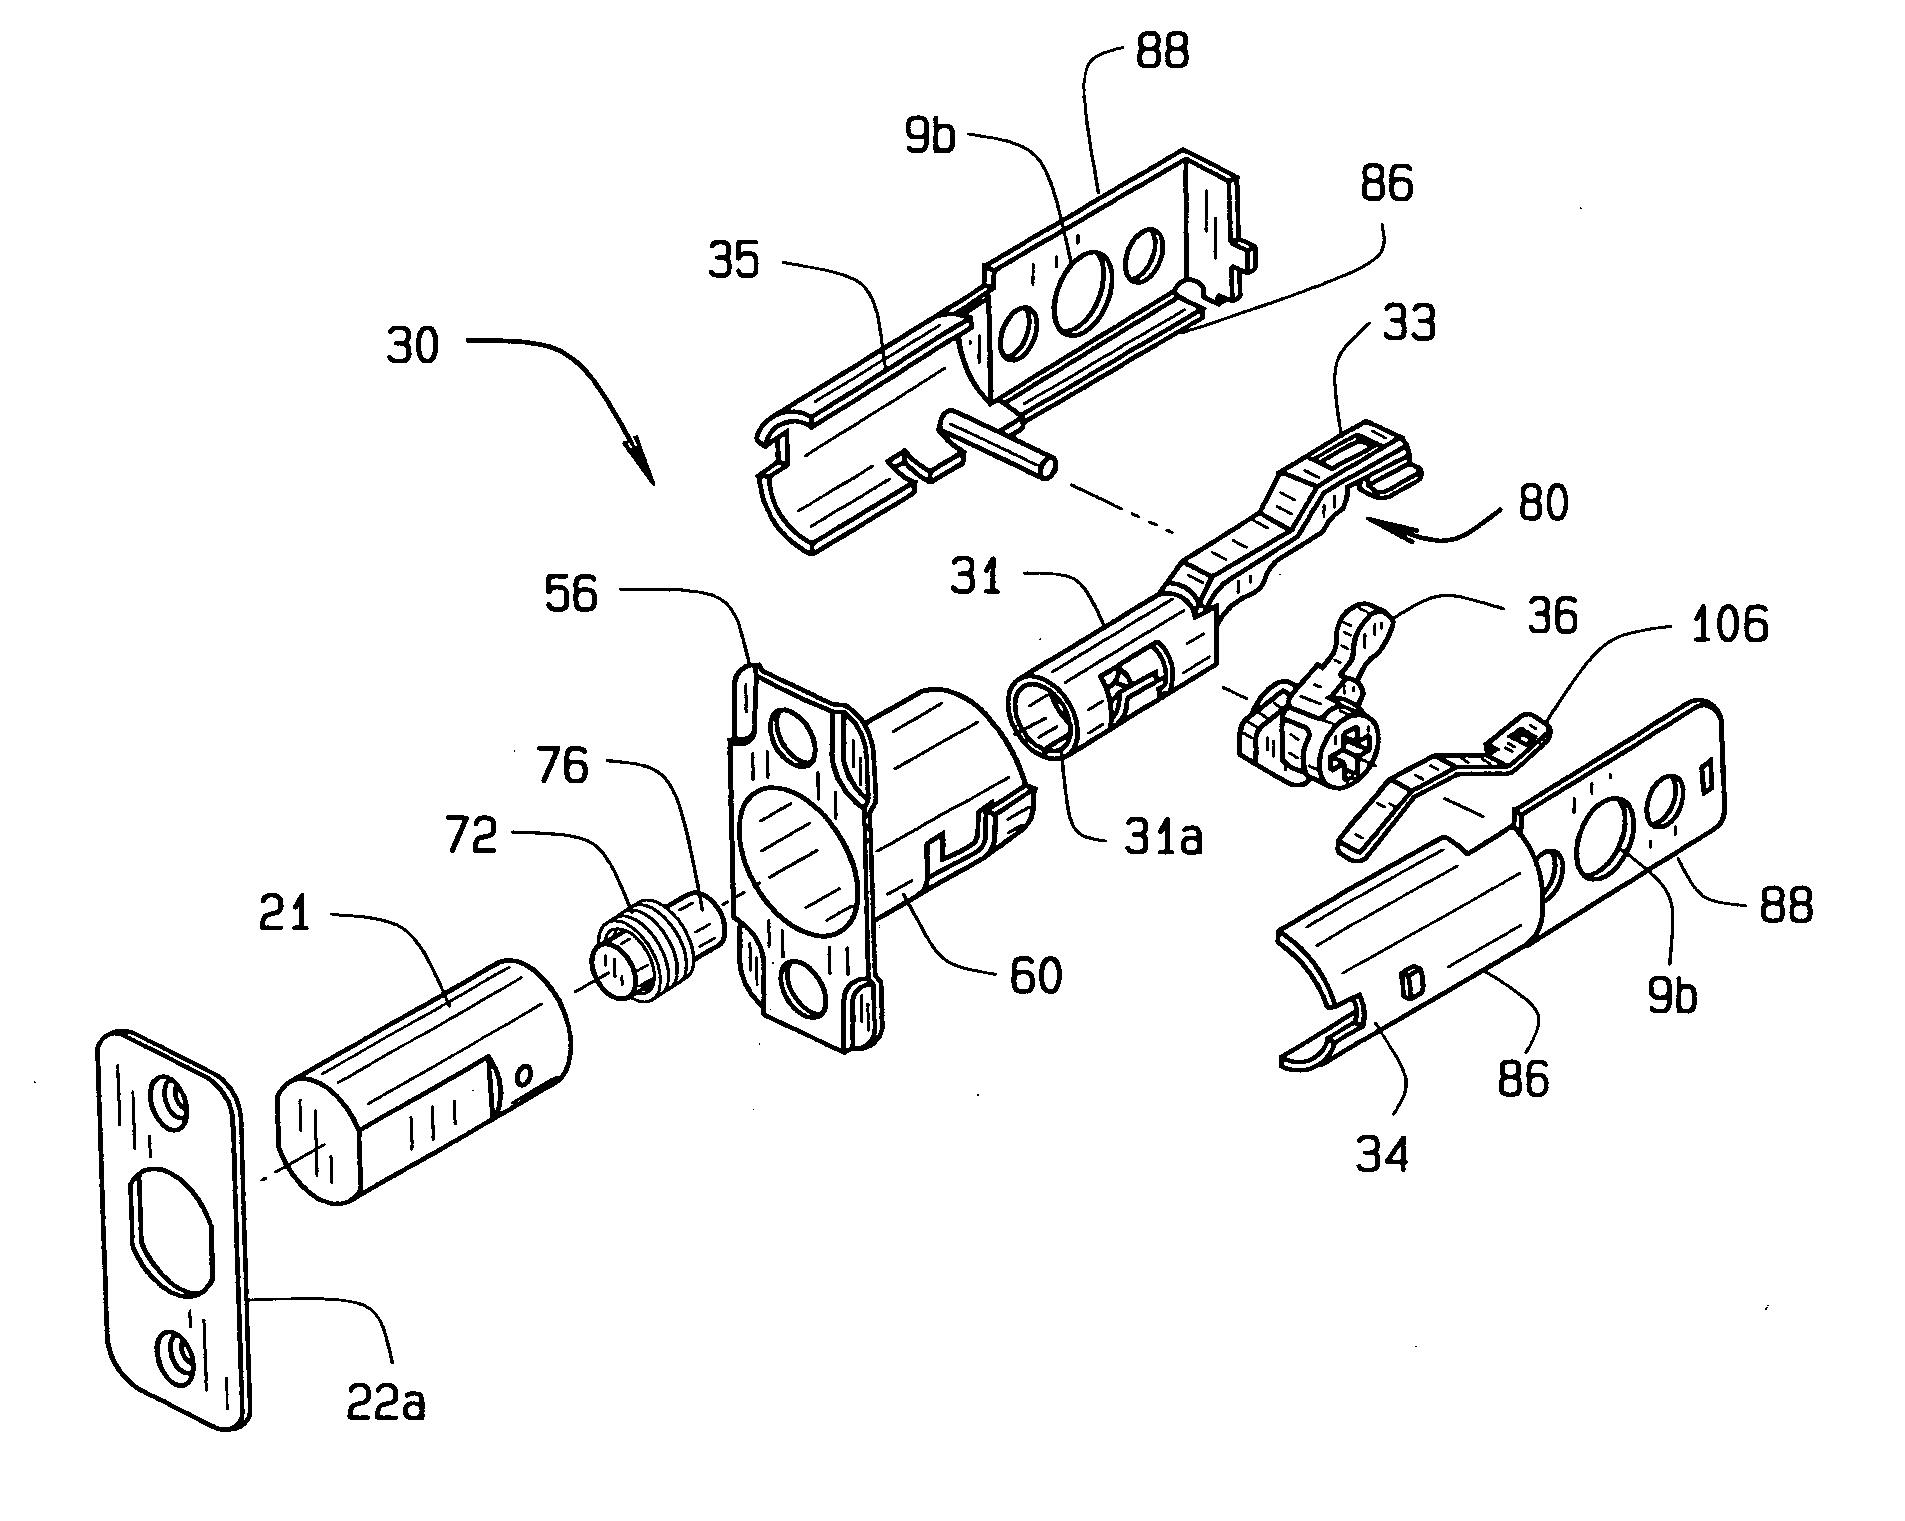 patent us20120234059 symmetrical uni directional single Parts of a Dead Bolt Lock Parts of a Dead Bolt Lock